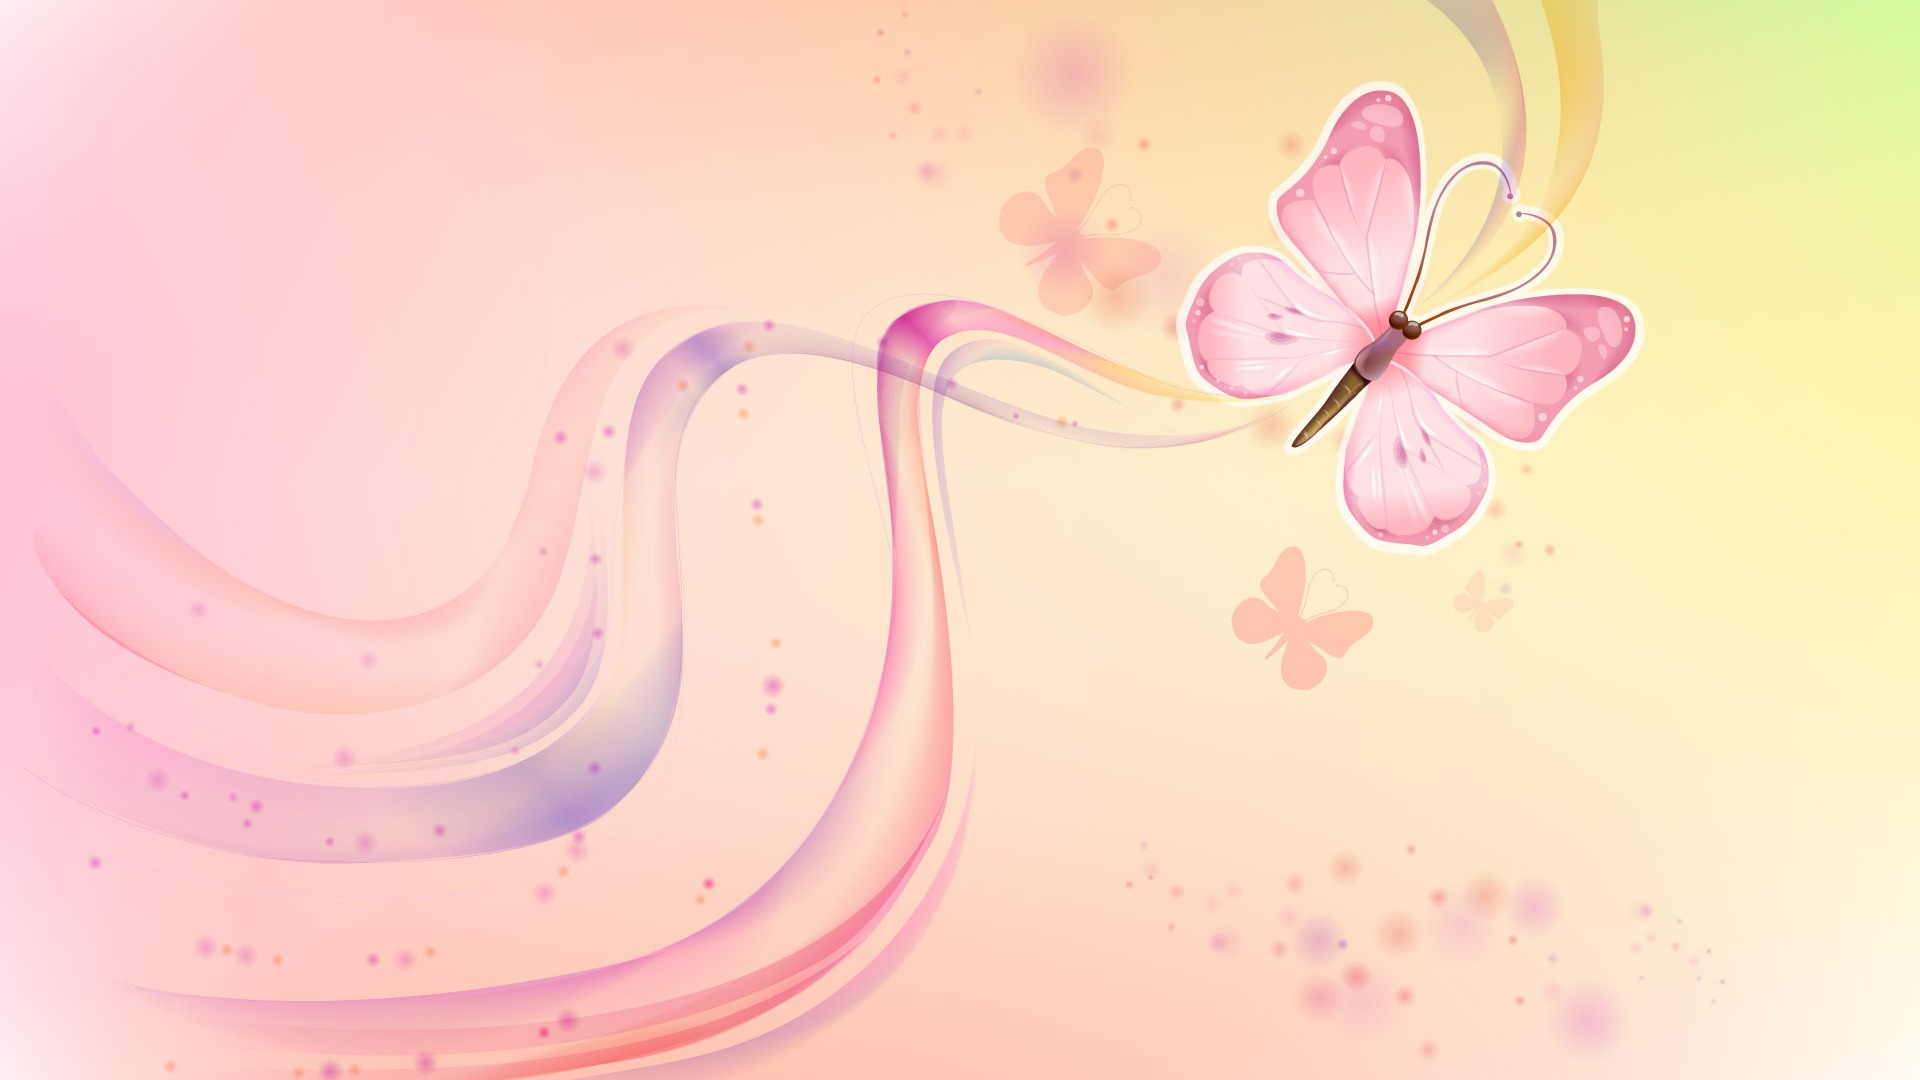 Butterfly Vector Design Background HD Wallpaper of Vector 1920x1080